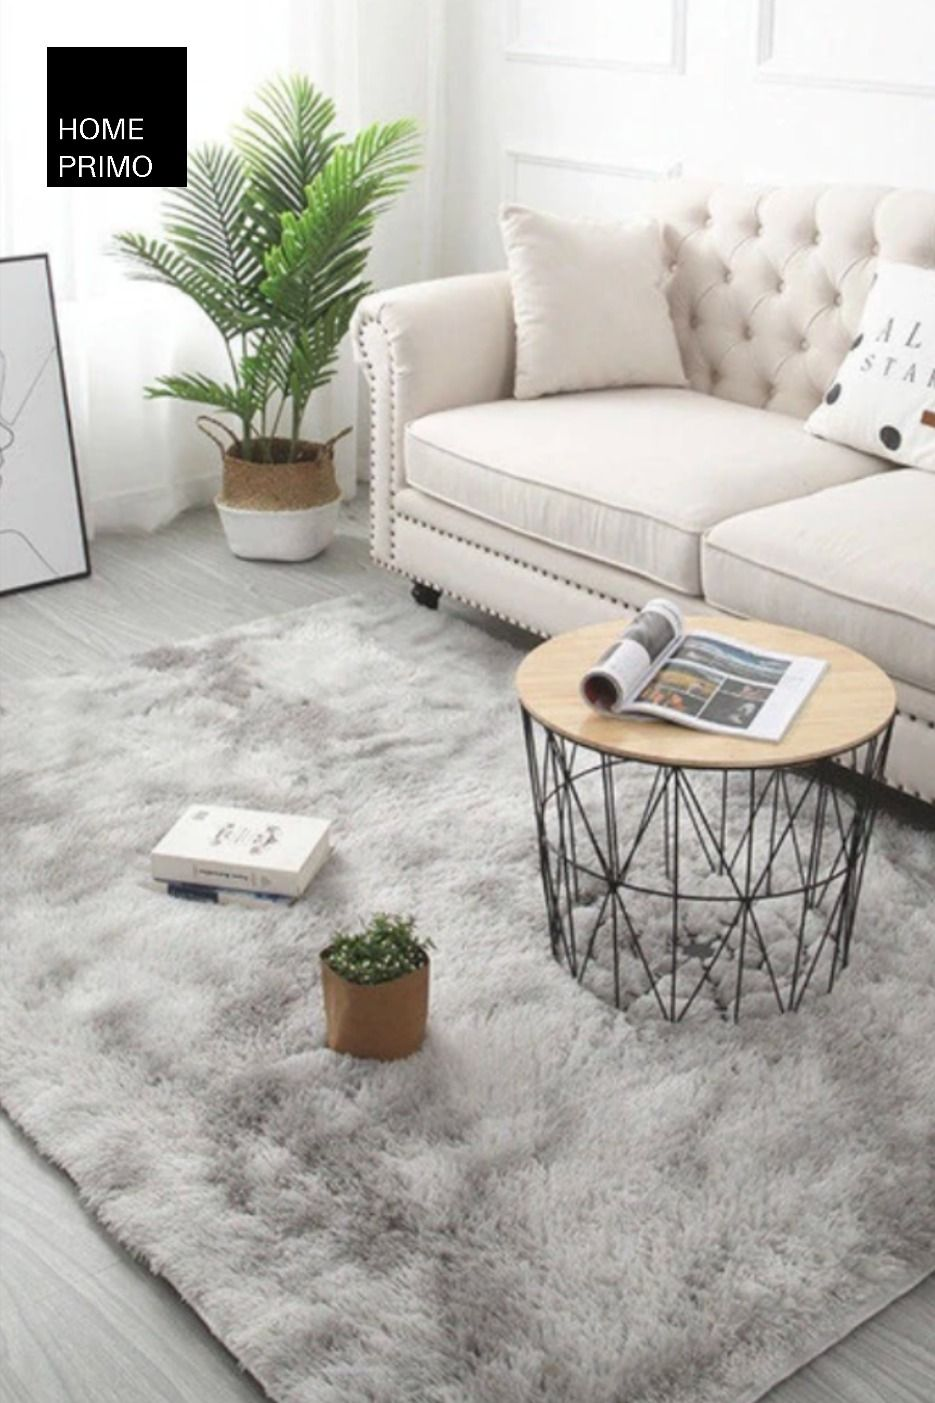 Living Room Rug Light Grey Color In 2020 Living Room Carpet Rugs In Living Room Comfy Rugs